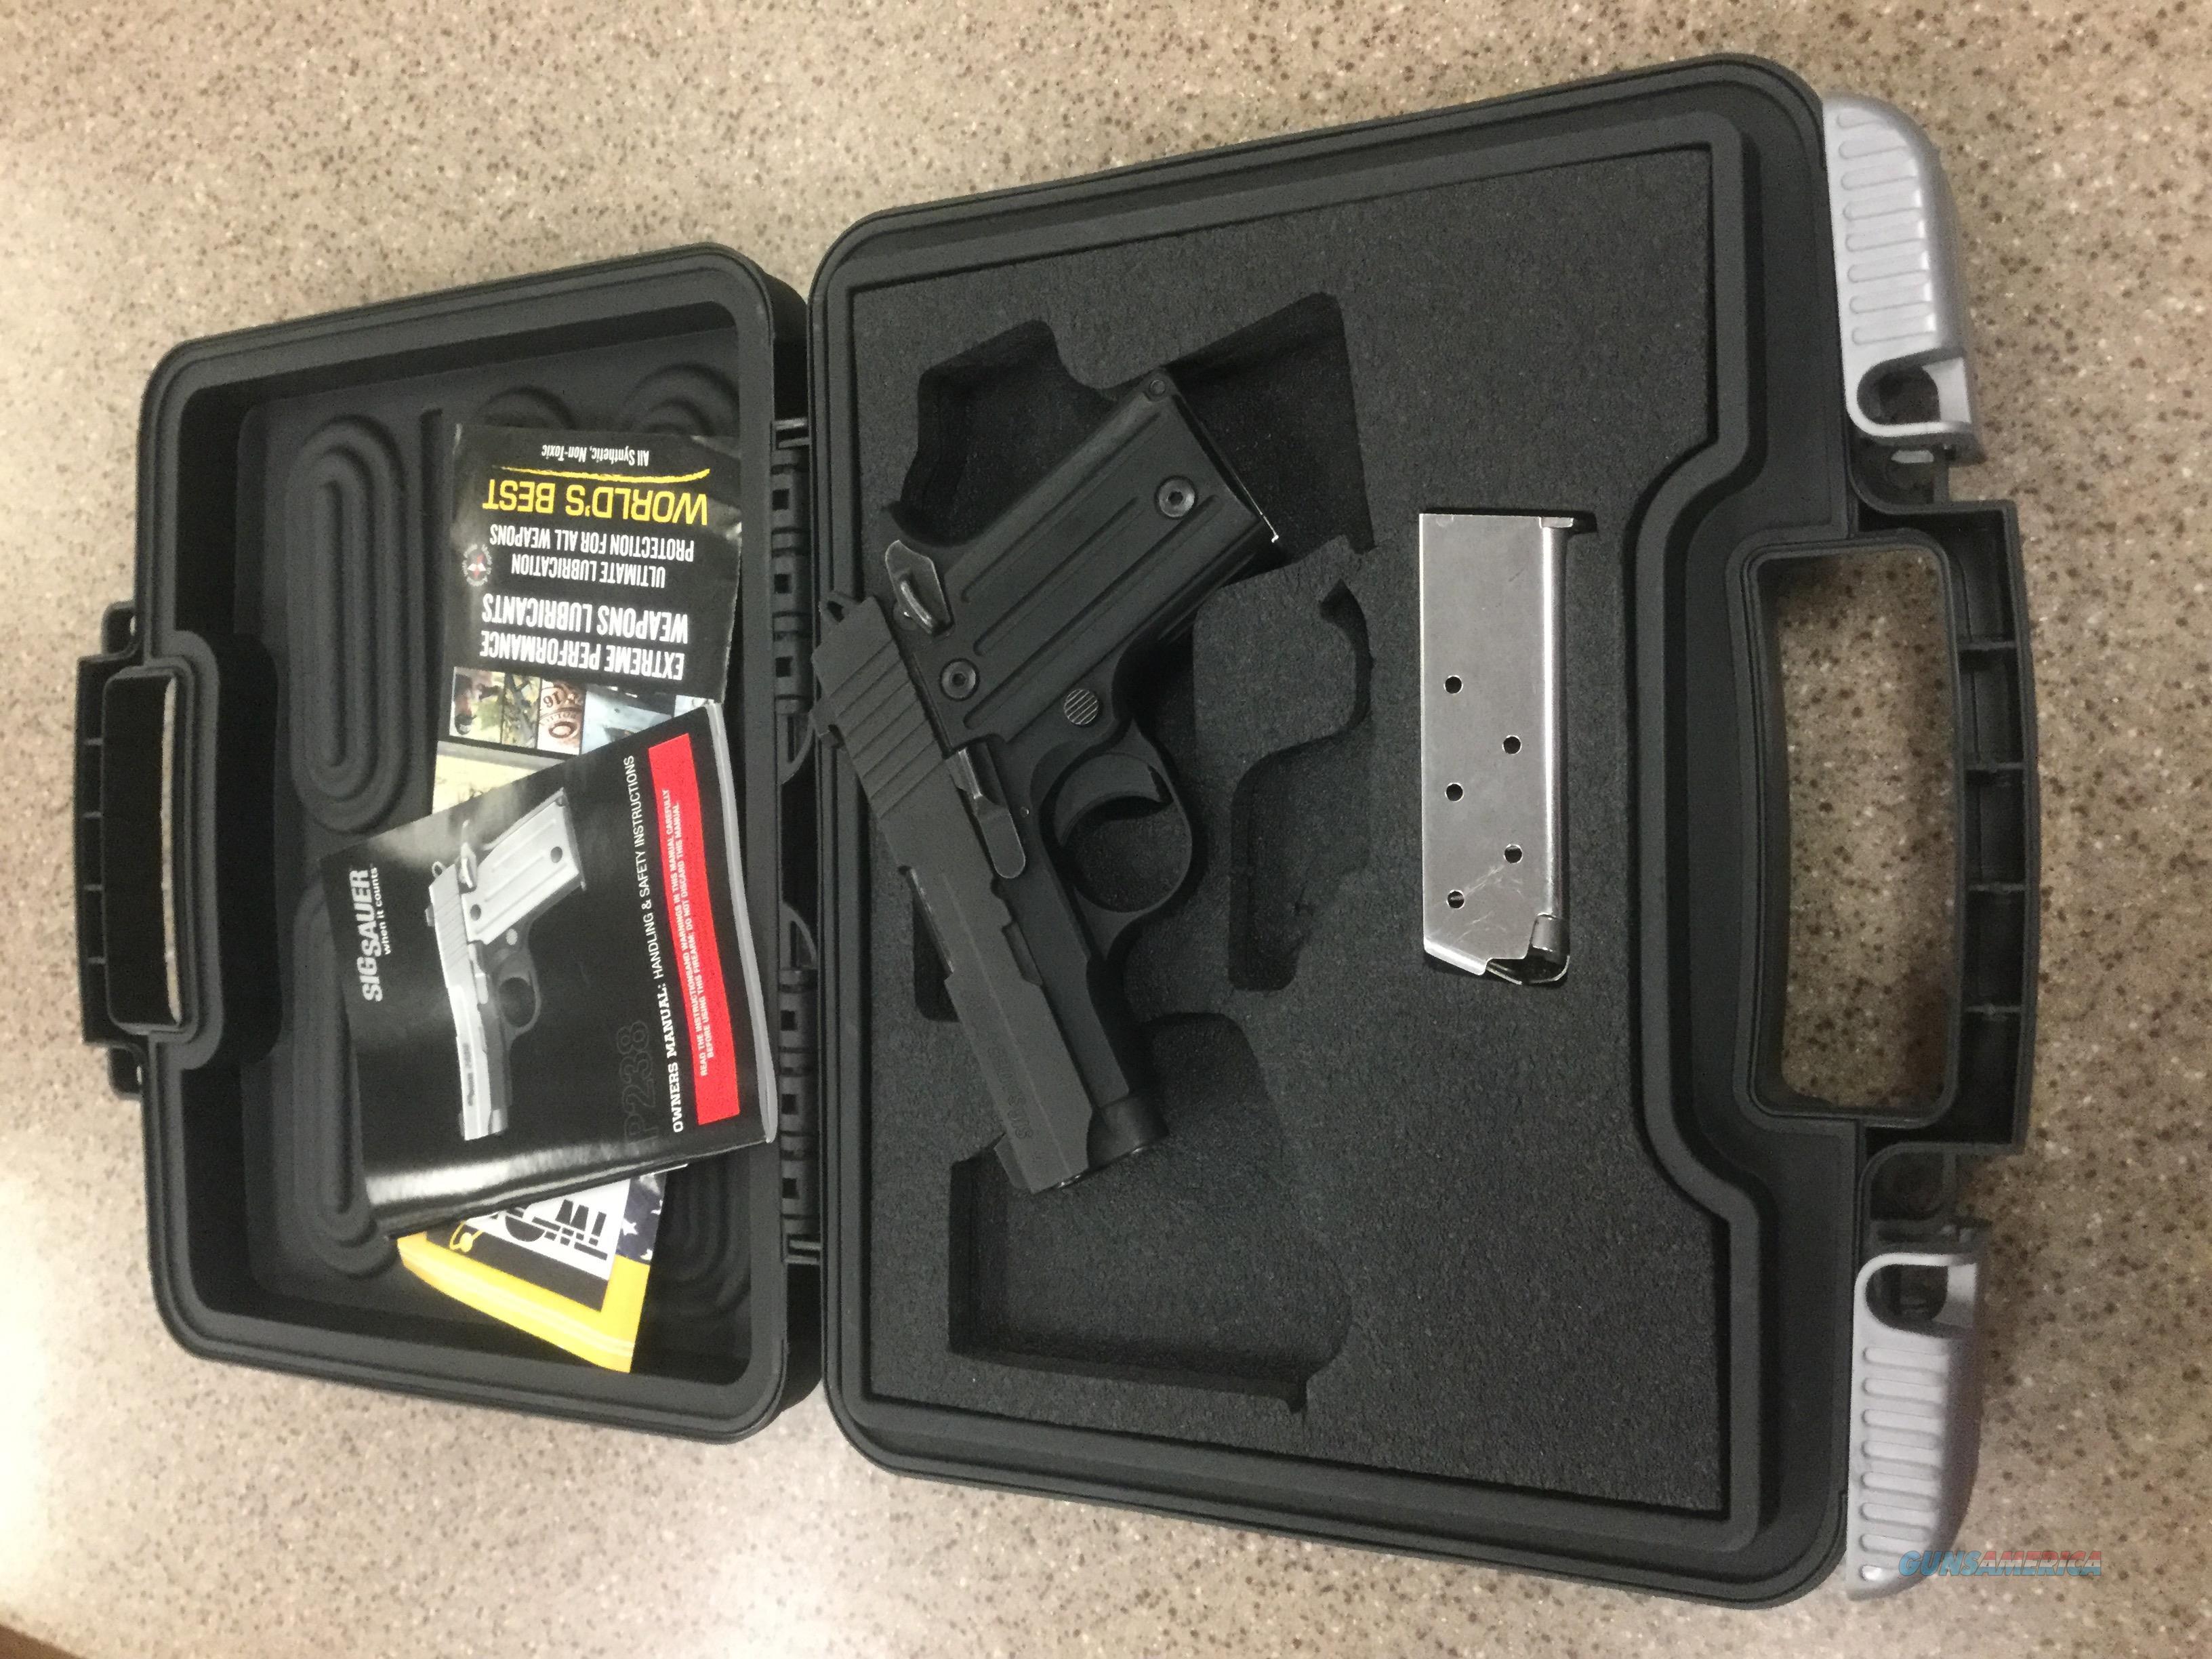 USED Sig Sauer P238 380ACP  Guns > Pistols > Sig - Sauer/Sigarms Pistols > P238